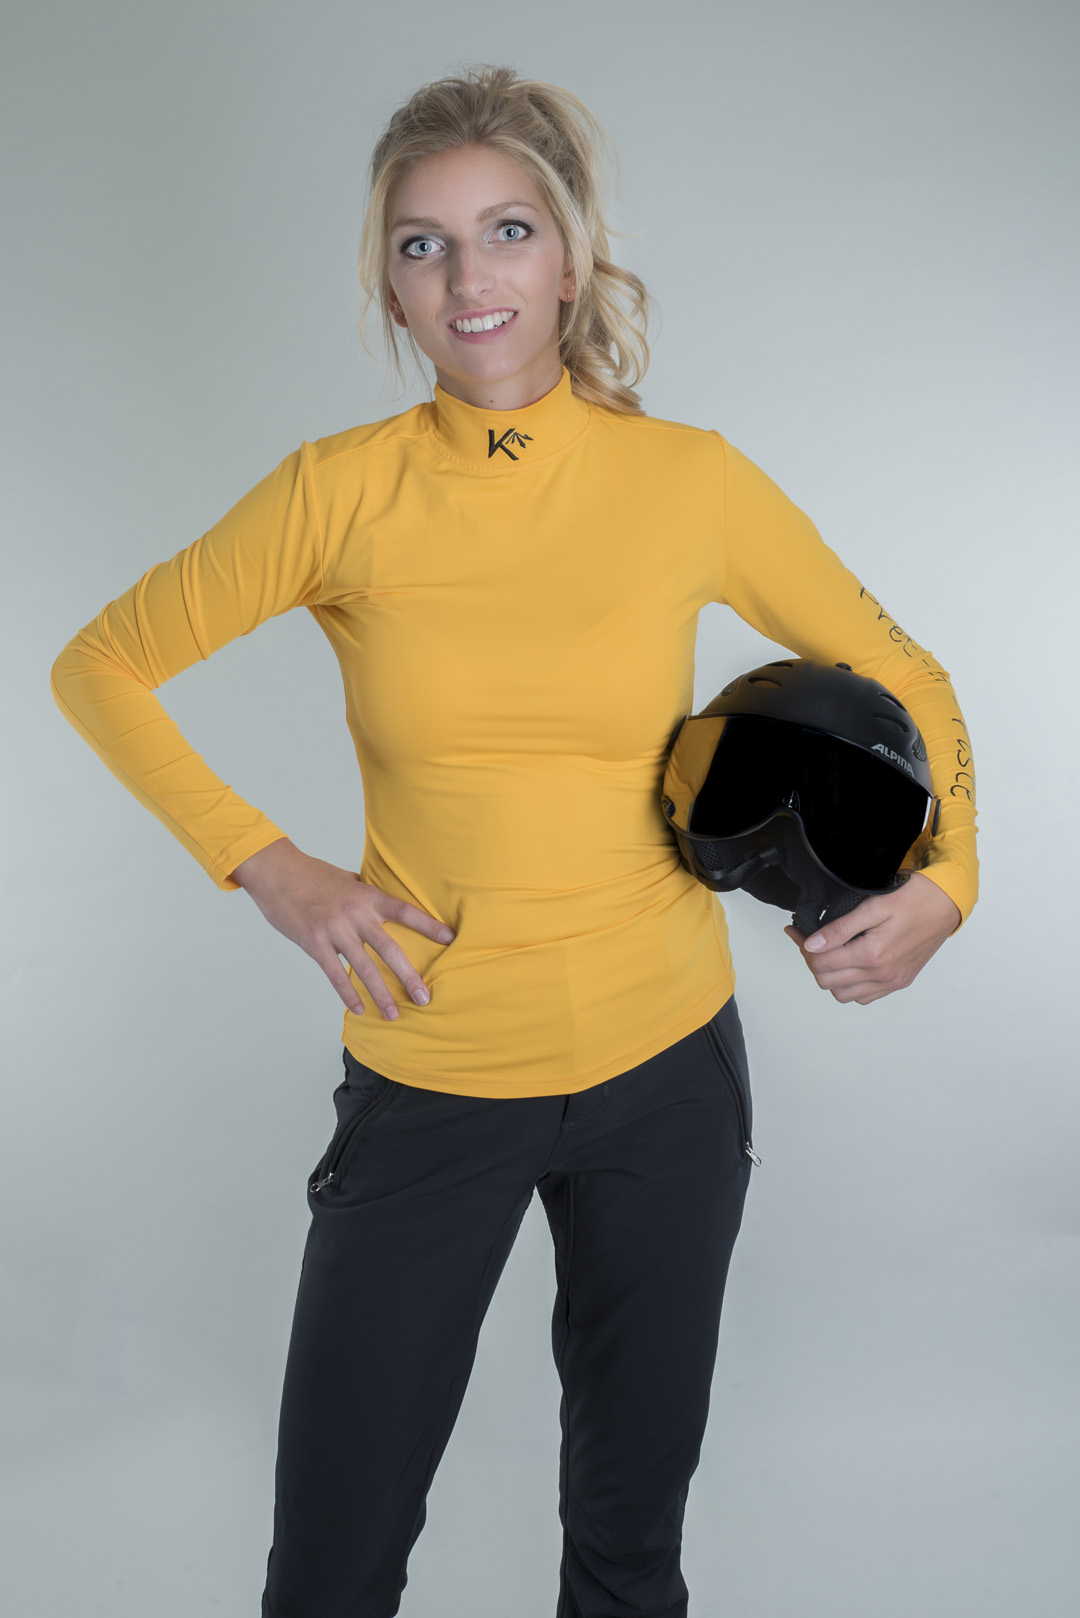 Pully basic yellow ski